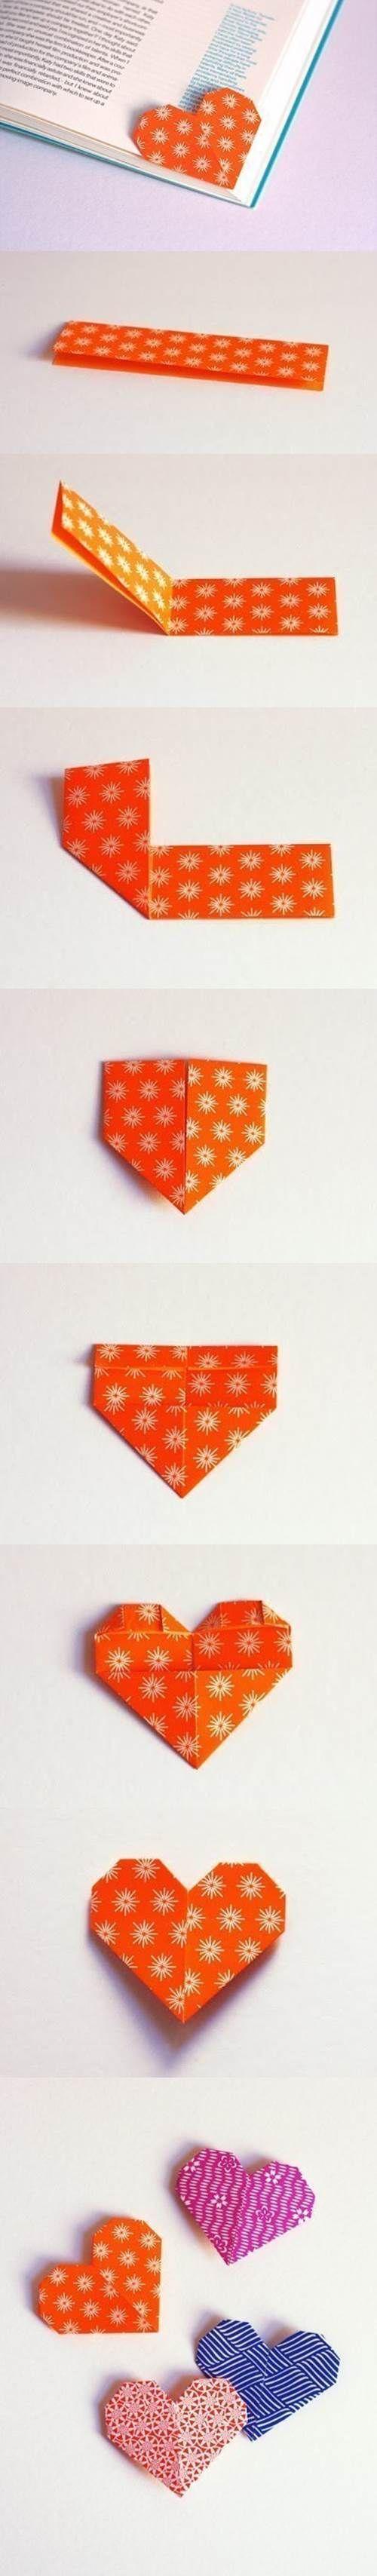 DIY Cute Origami Heart Shaped Bookmark | iCreativeIdeas.com Like Us on Facebook ==> https://www.facebook.com/icreativeideas